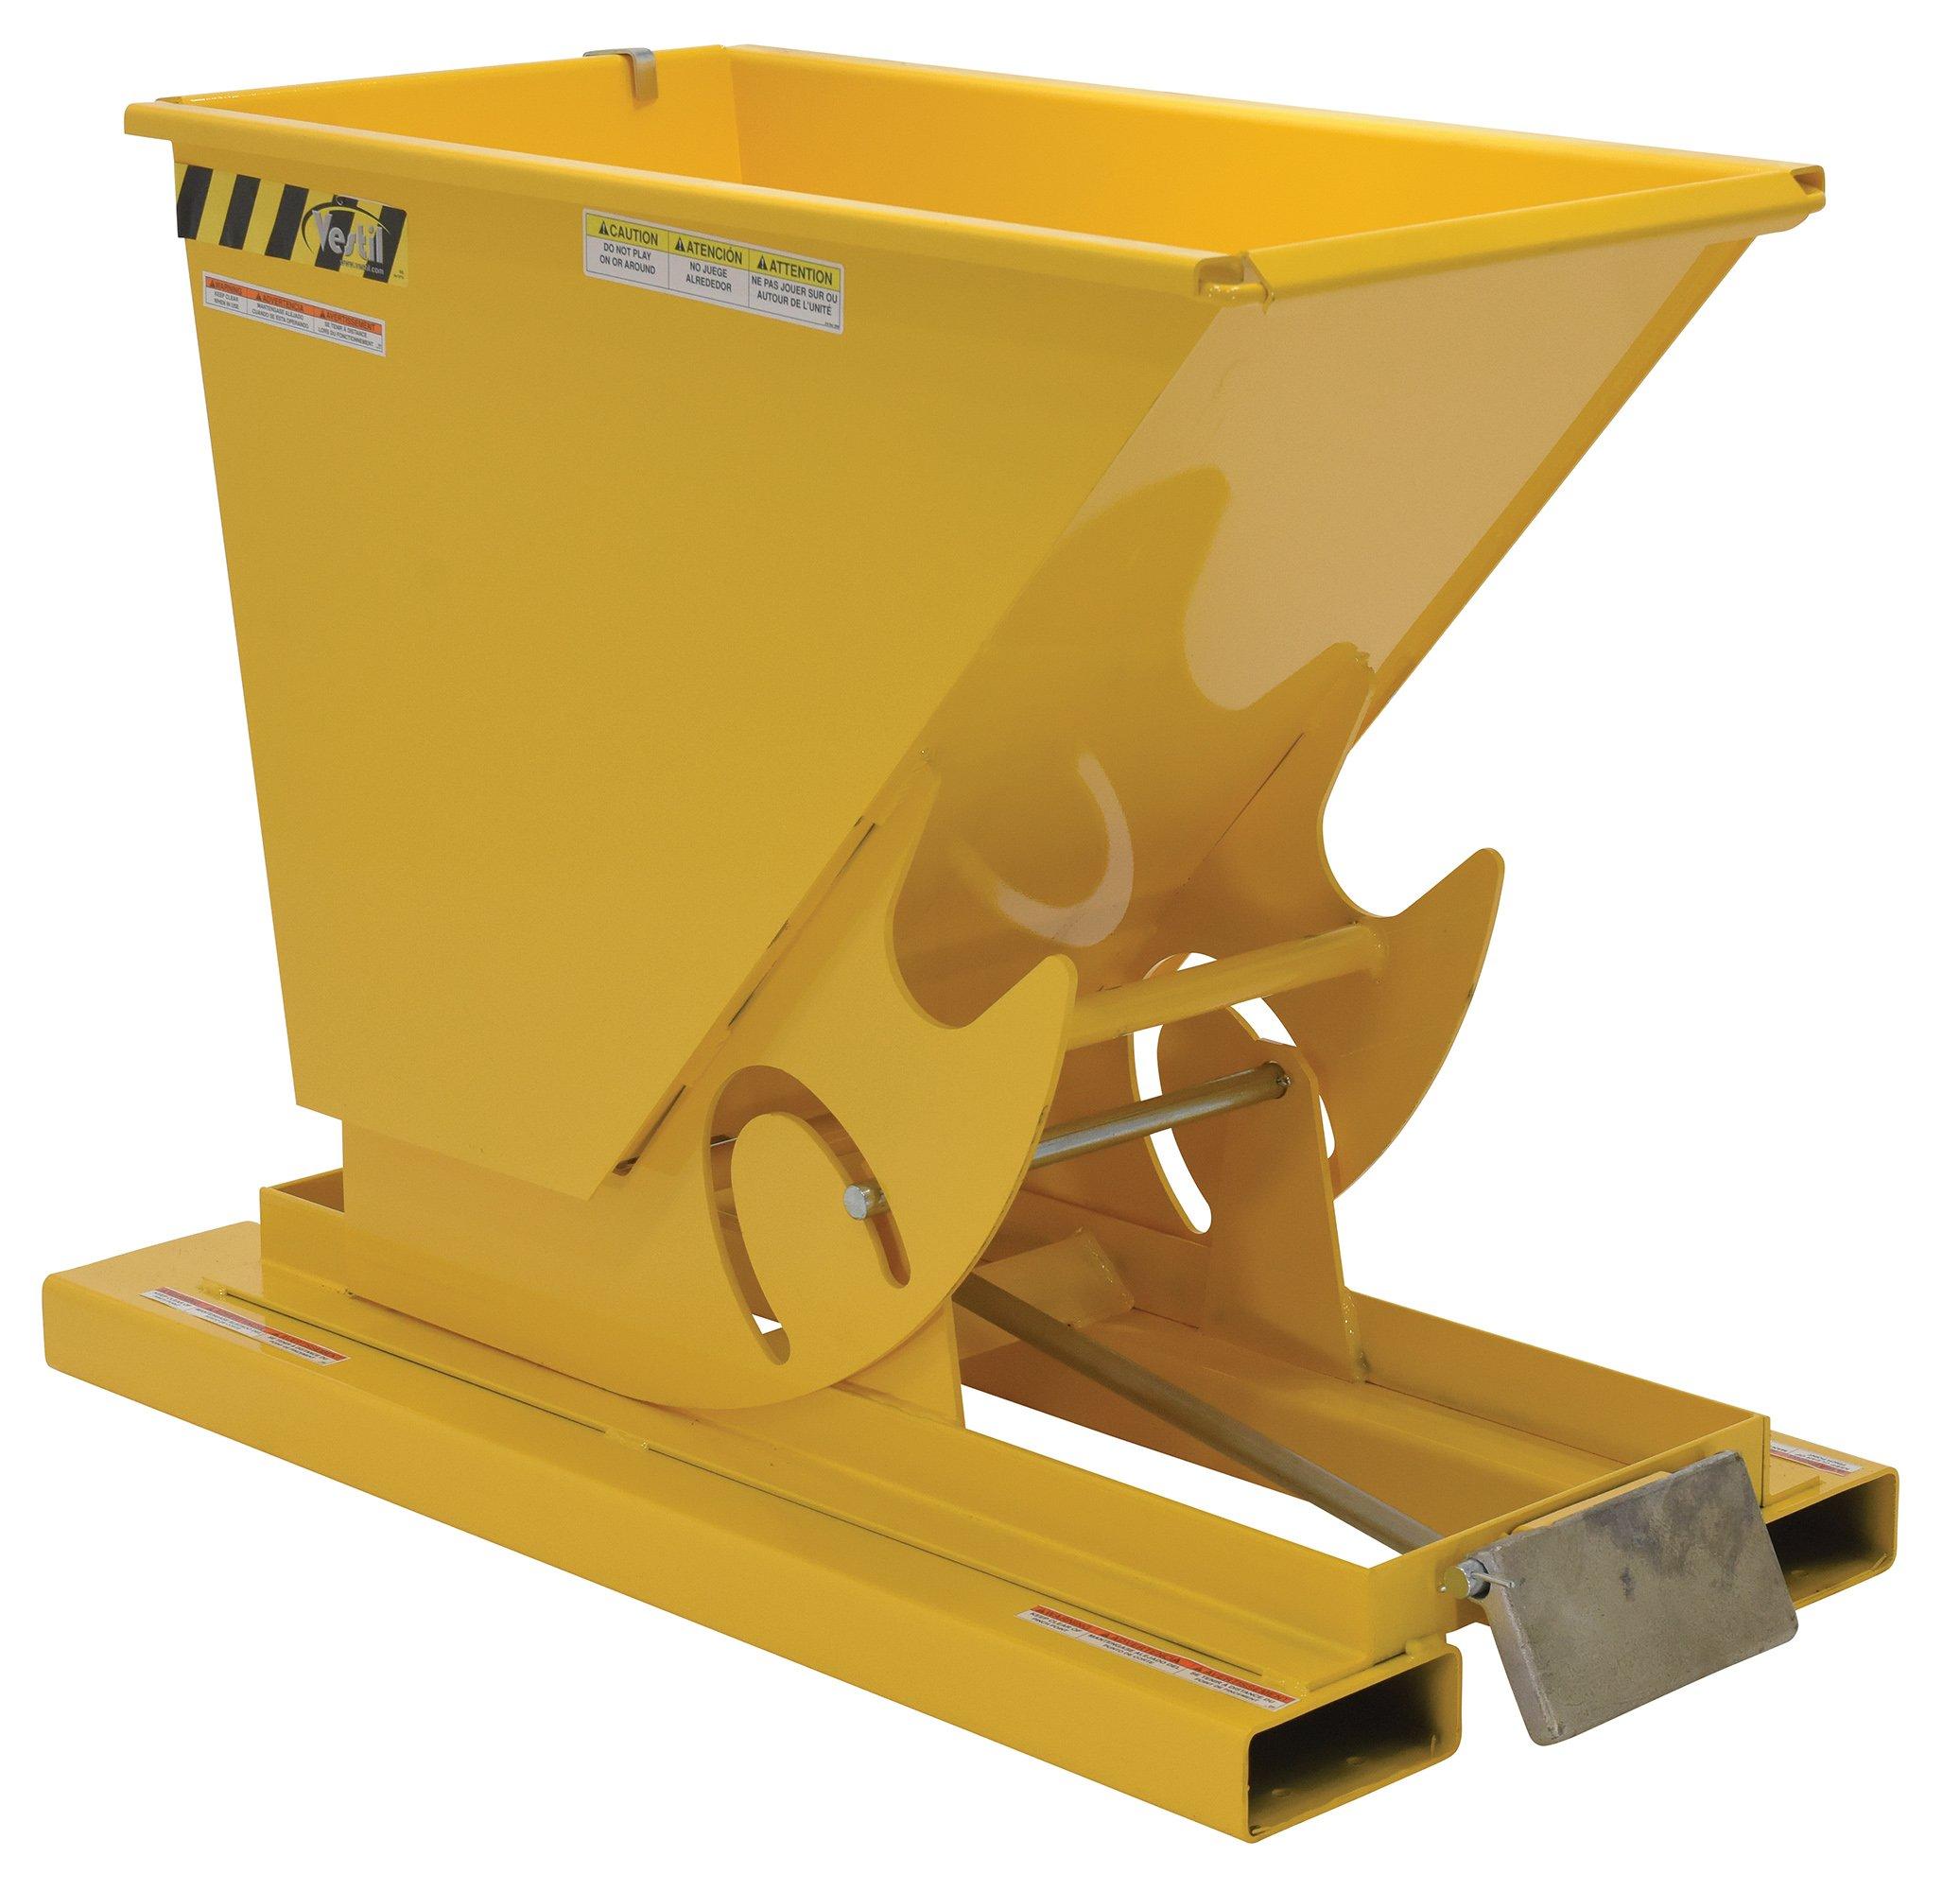 Vestil D-25-LD-YEL Self-Dump LD Hopper, 0.25 cu. yd, 2000 lb. Capacity, Overall L x W x H (in.) 51-7/8'' x 26'' x 38'', Yellow